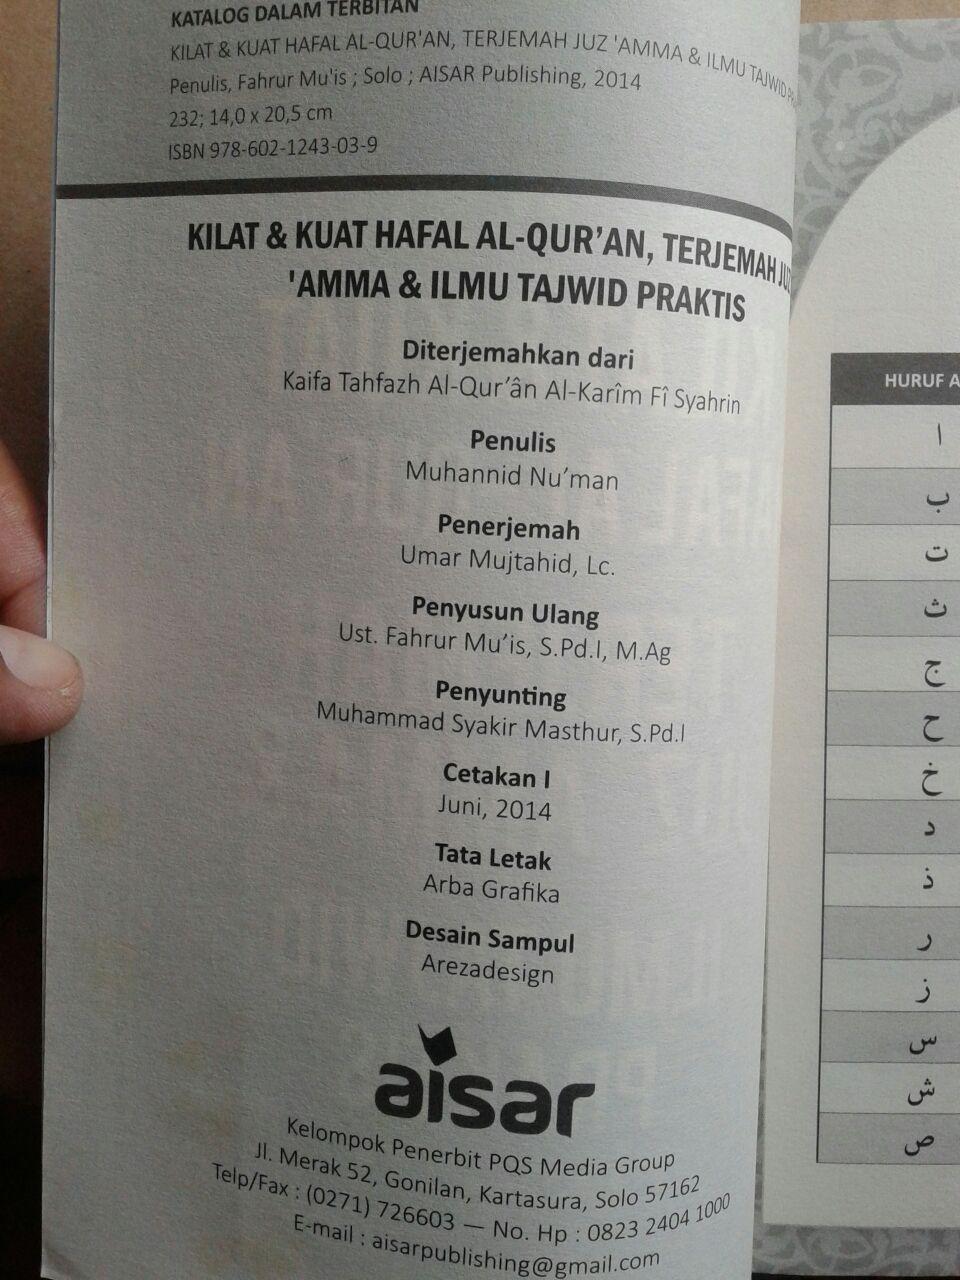 Buku Kilat Dan Kuat Hafal Al-Qur'an Terjemah Juz Amma Tajwid isi